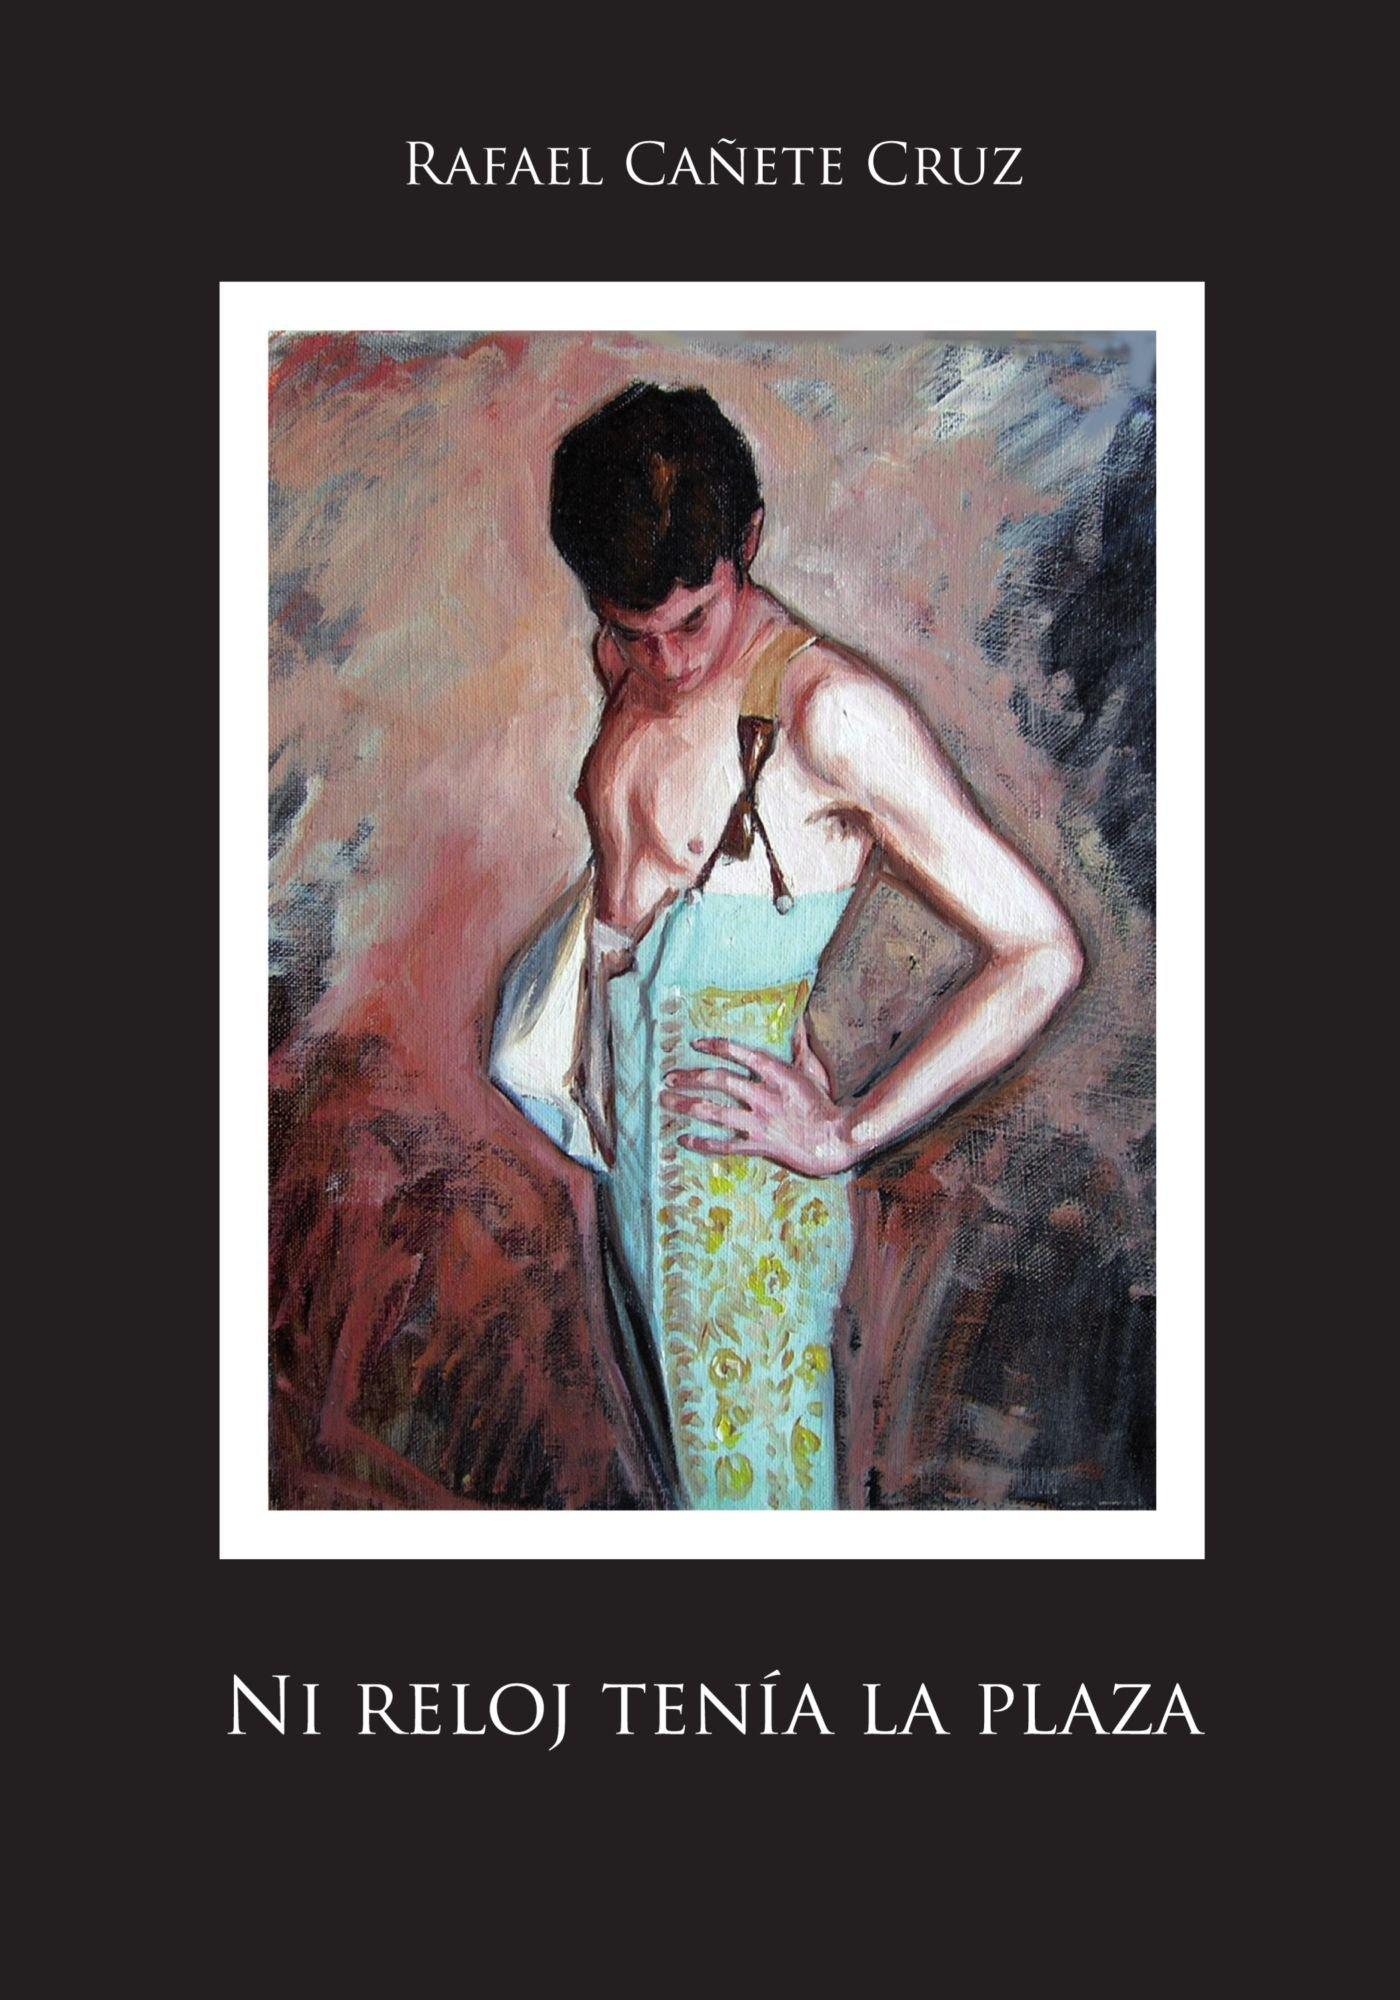 Ni reloj tenía la plaza (Spanish Edition) (Spanish) Paperback – November 13, 2008